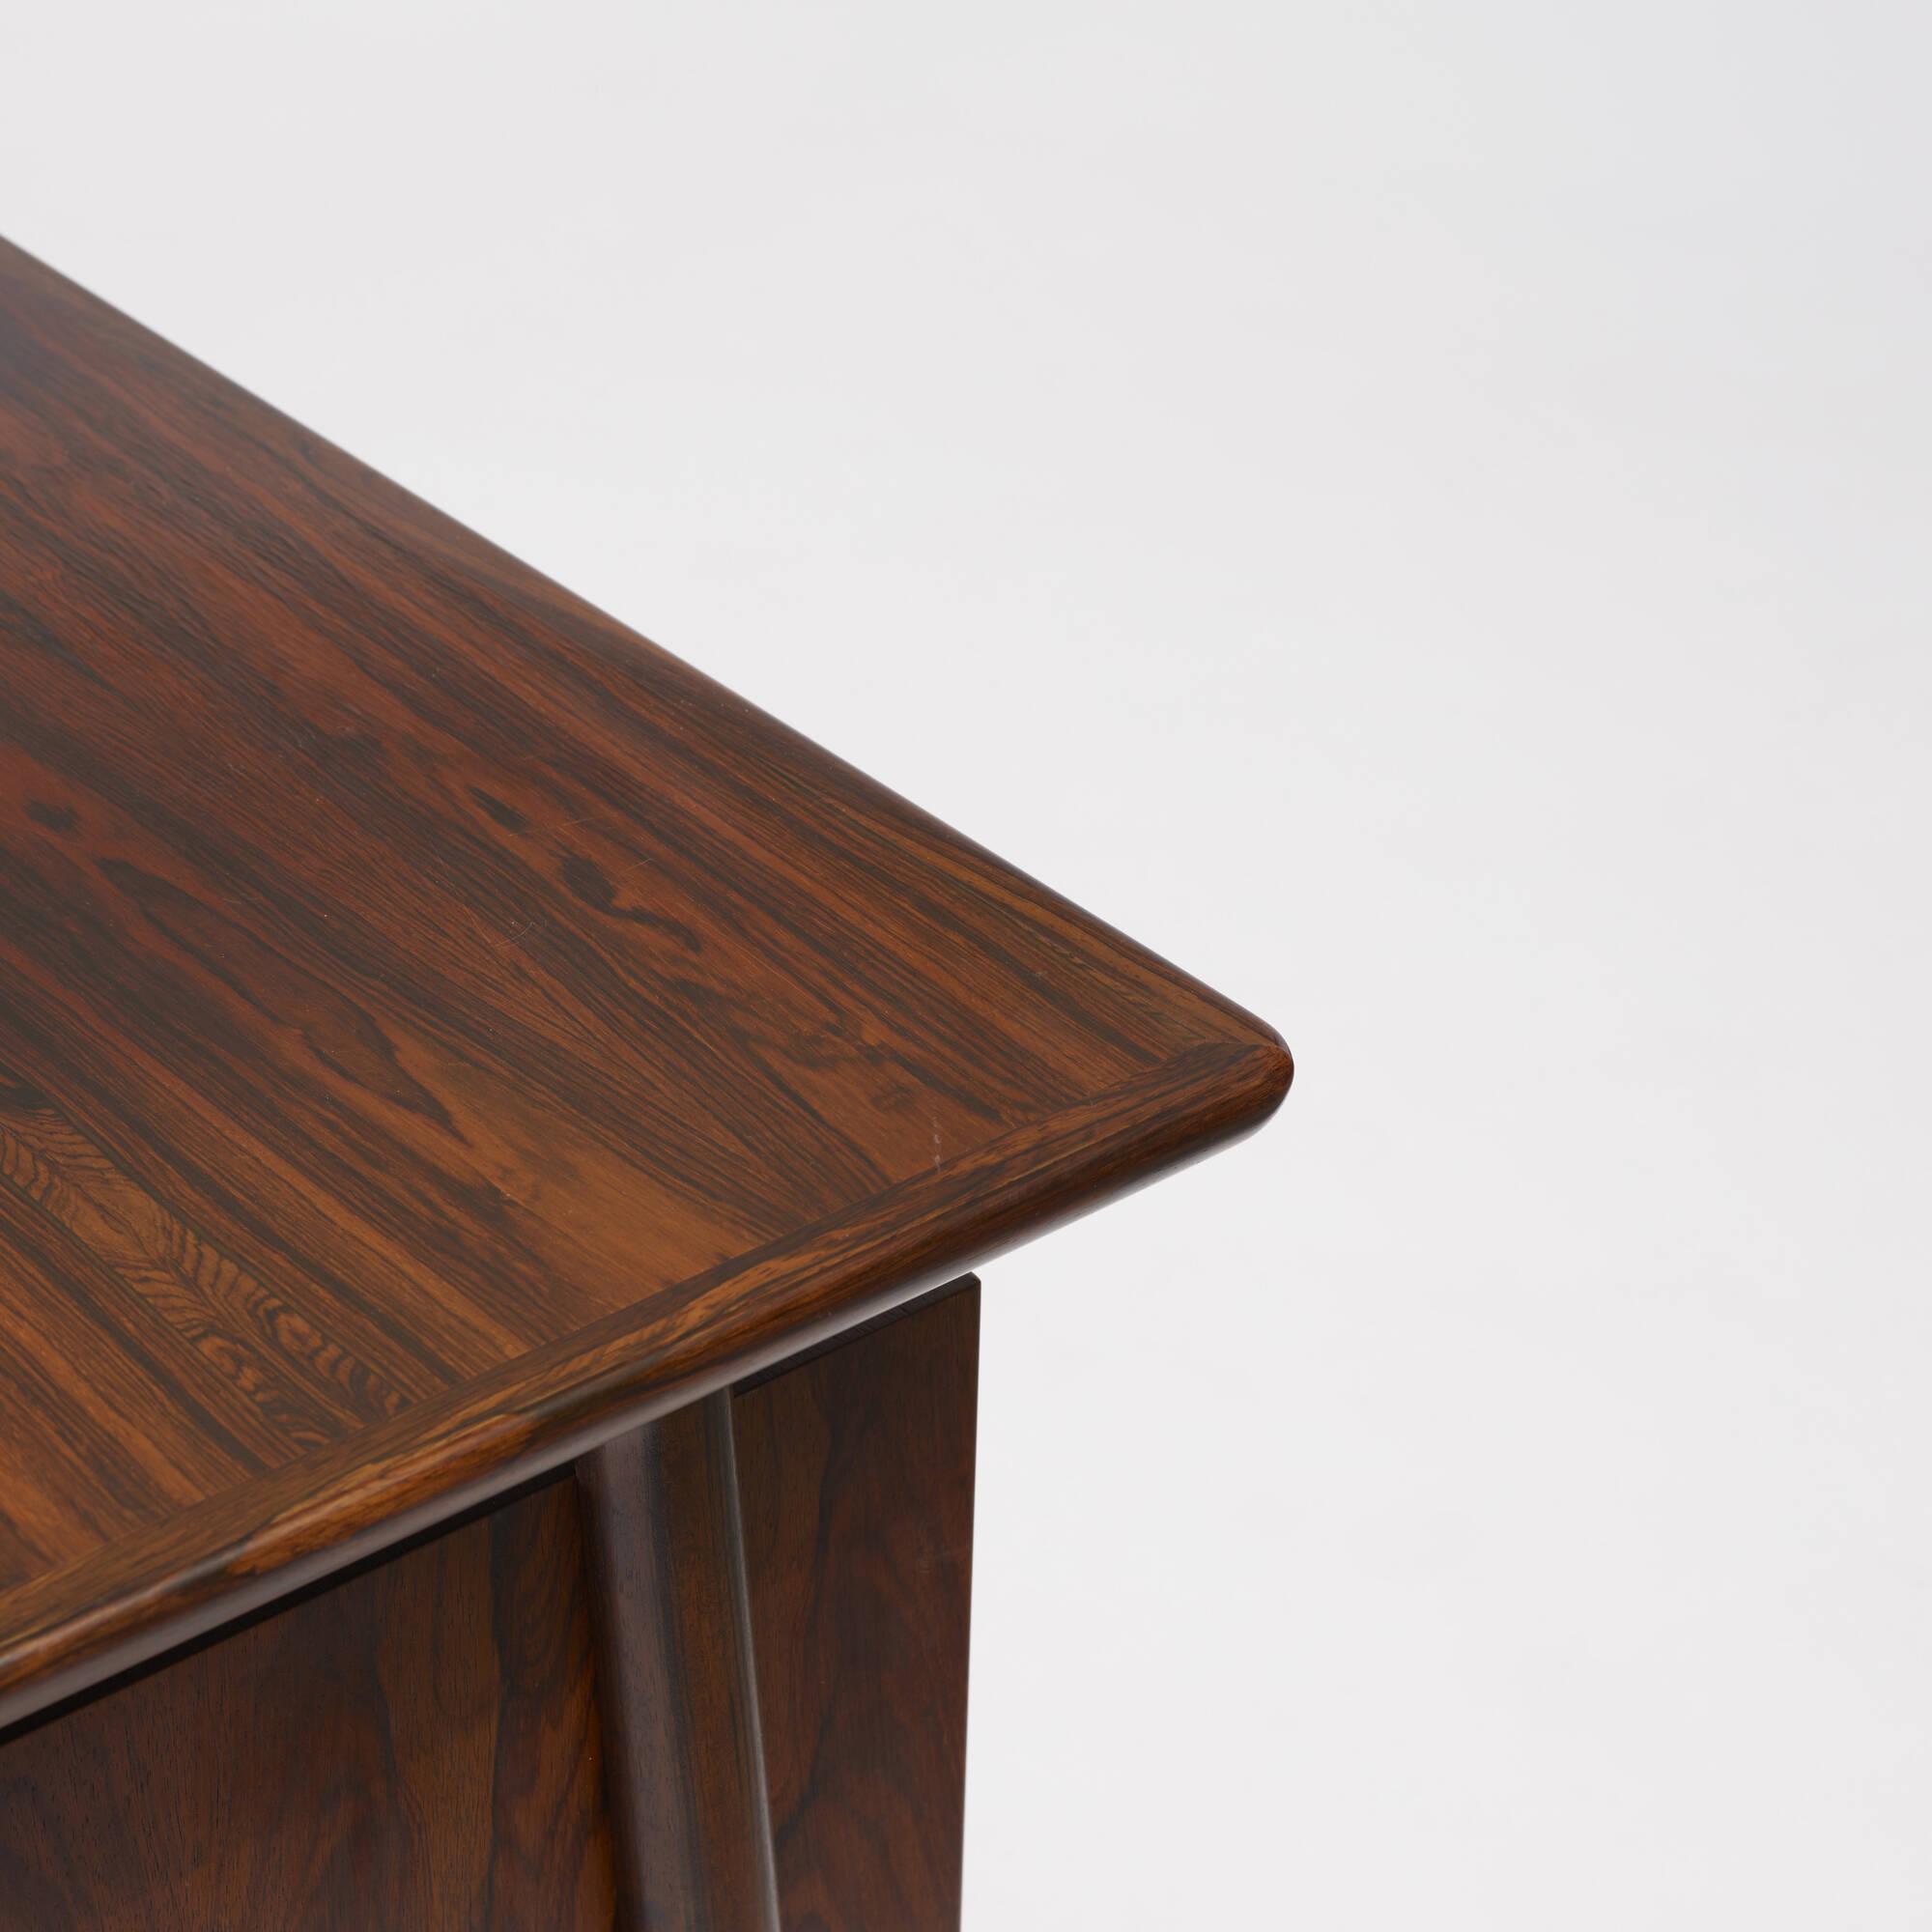 225: Gunni Omann / desk, model No. 75 (3 of 3)